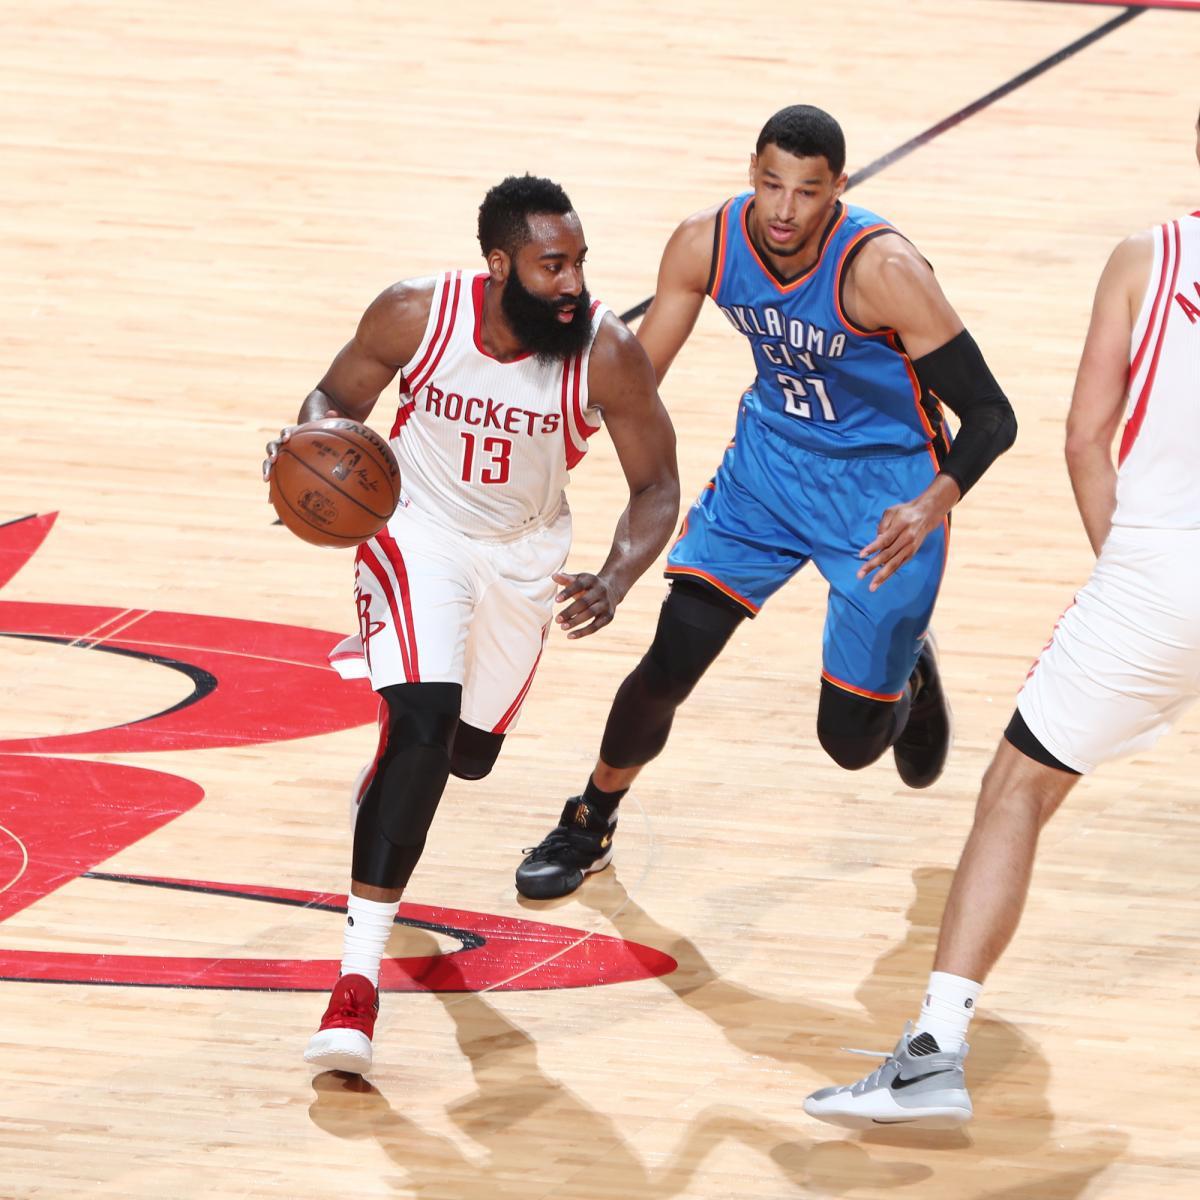 James Harden Points Last Night: James Harden, Rockets Win Game 2 115-111 Despite Russell